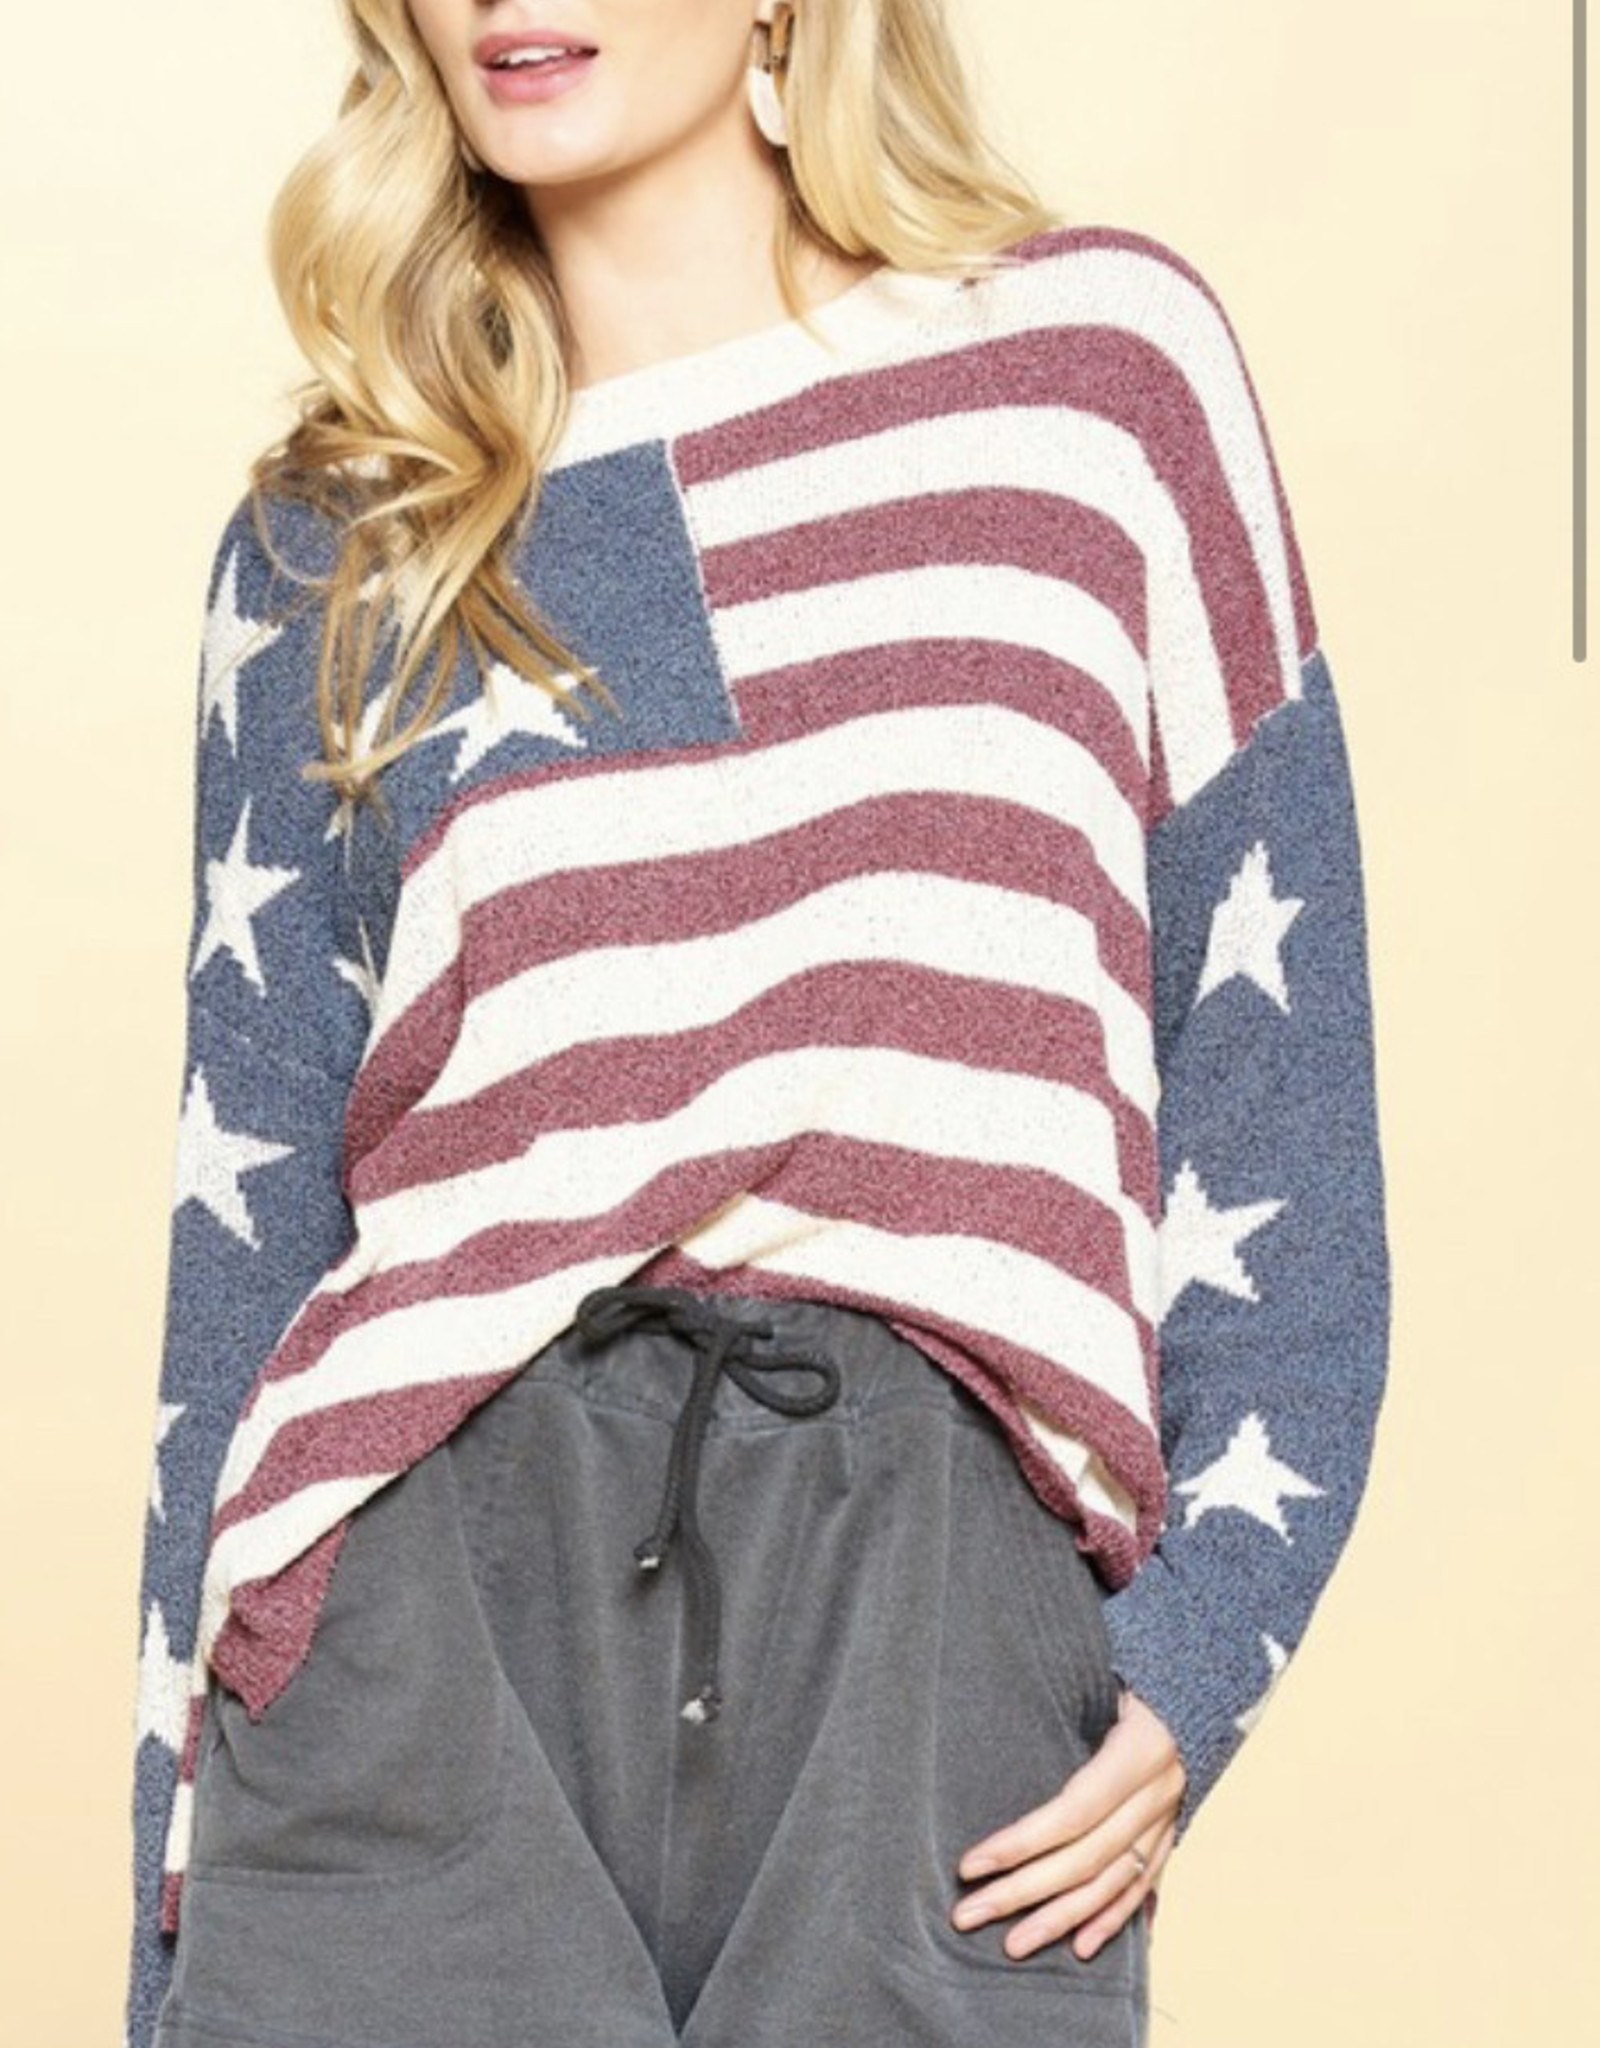 TLC Stars & Stripes crew neck sweater